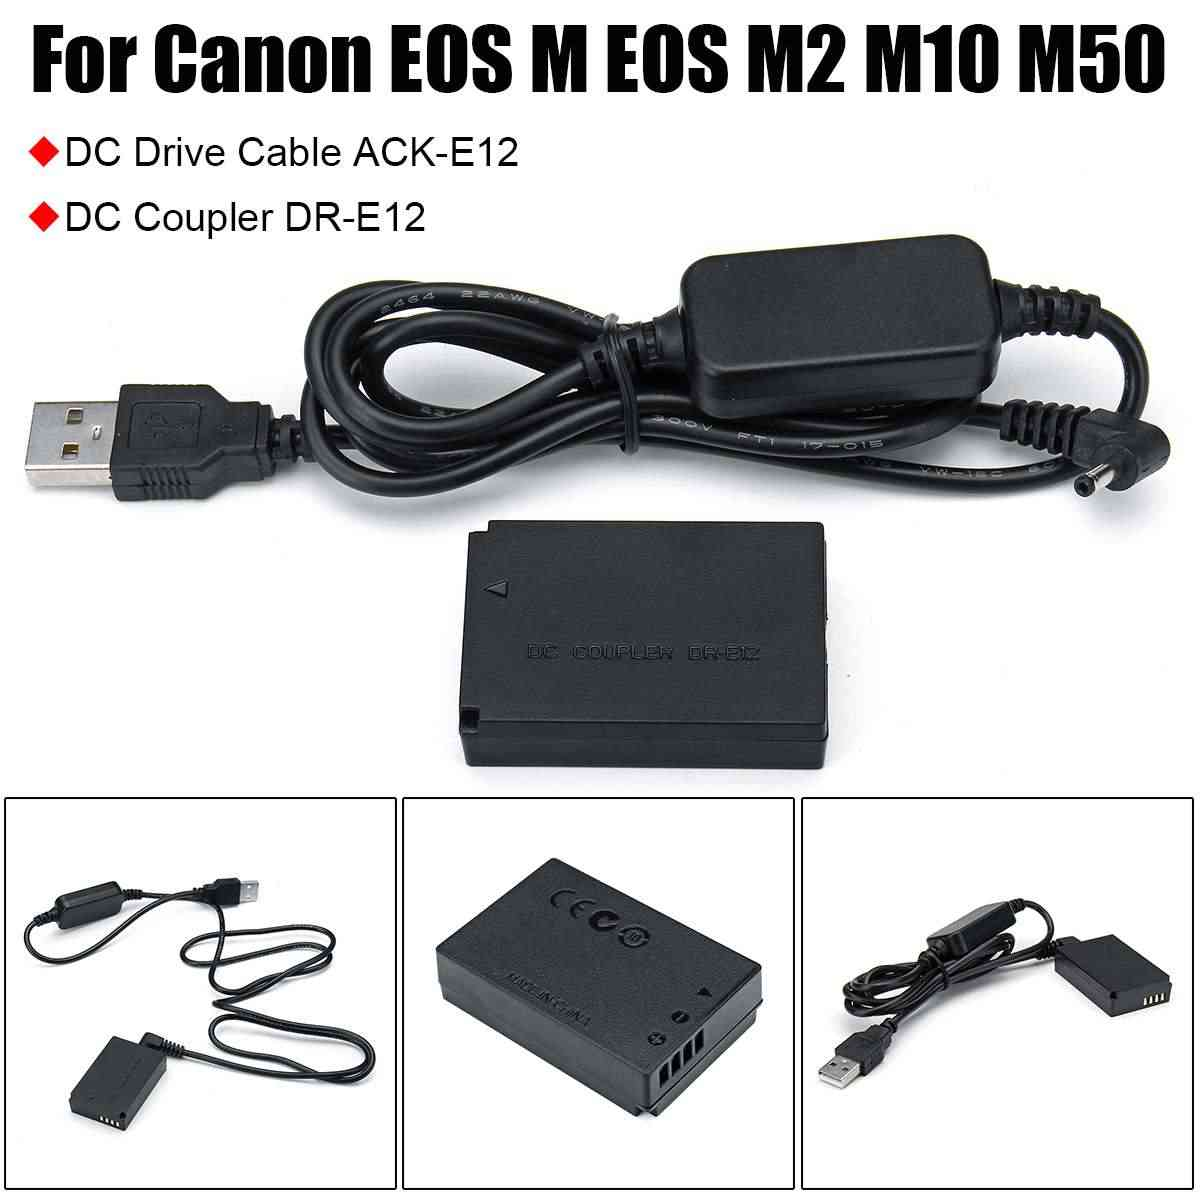 5 V كابل يو اس بي DC 8.4 V ACK-E12 المحمول قوة البنك + DR-E12 DC المقرنة LP-E12 الدمية بطارية لكاميرات كانون EOS M EOS m2 M10 M50 كاميرا